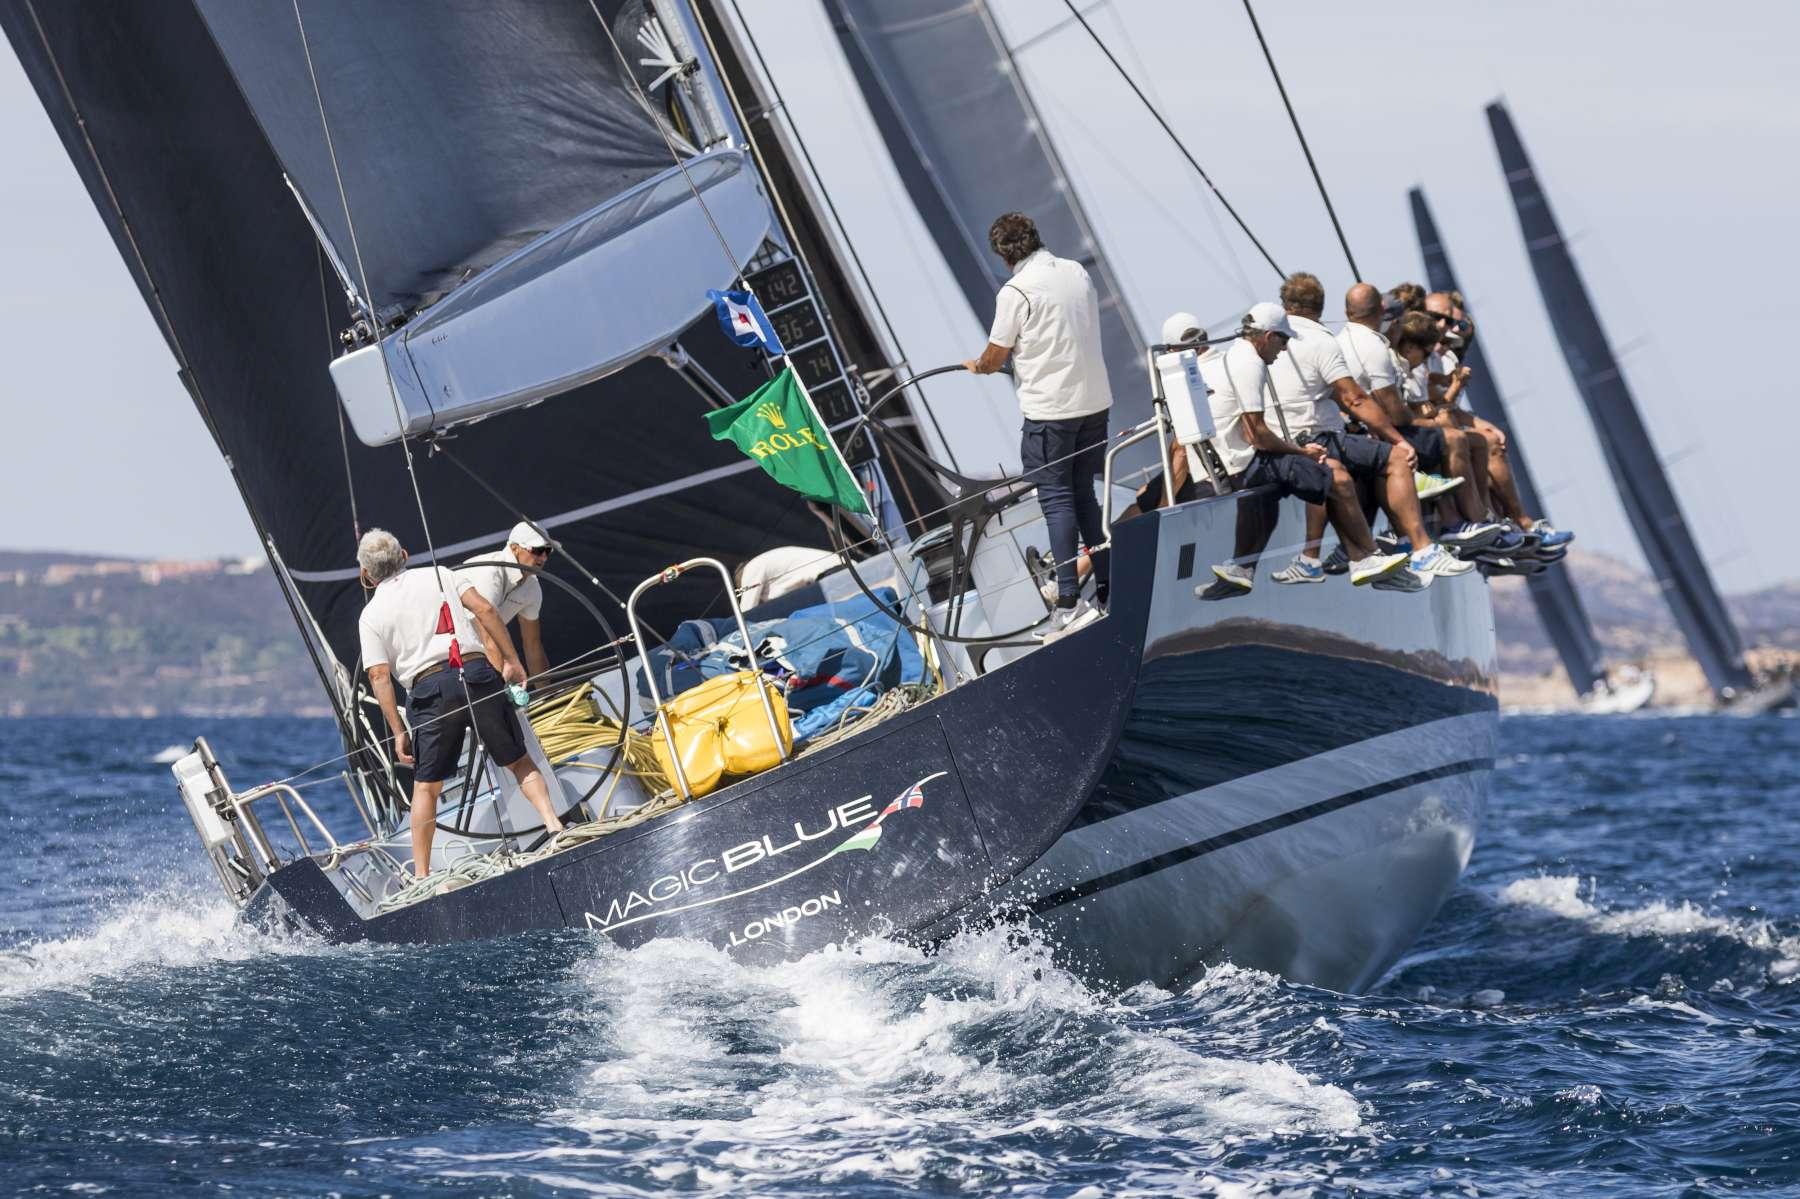 Maxi Yacht Rolex Cup & Rolex Maxi 72 Worlds - Foto Day 2 online - NEWS - Yacht Club Costa Smeralda